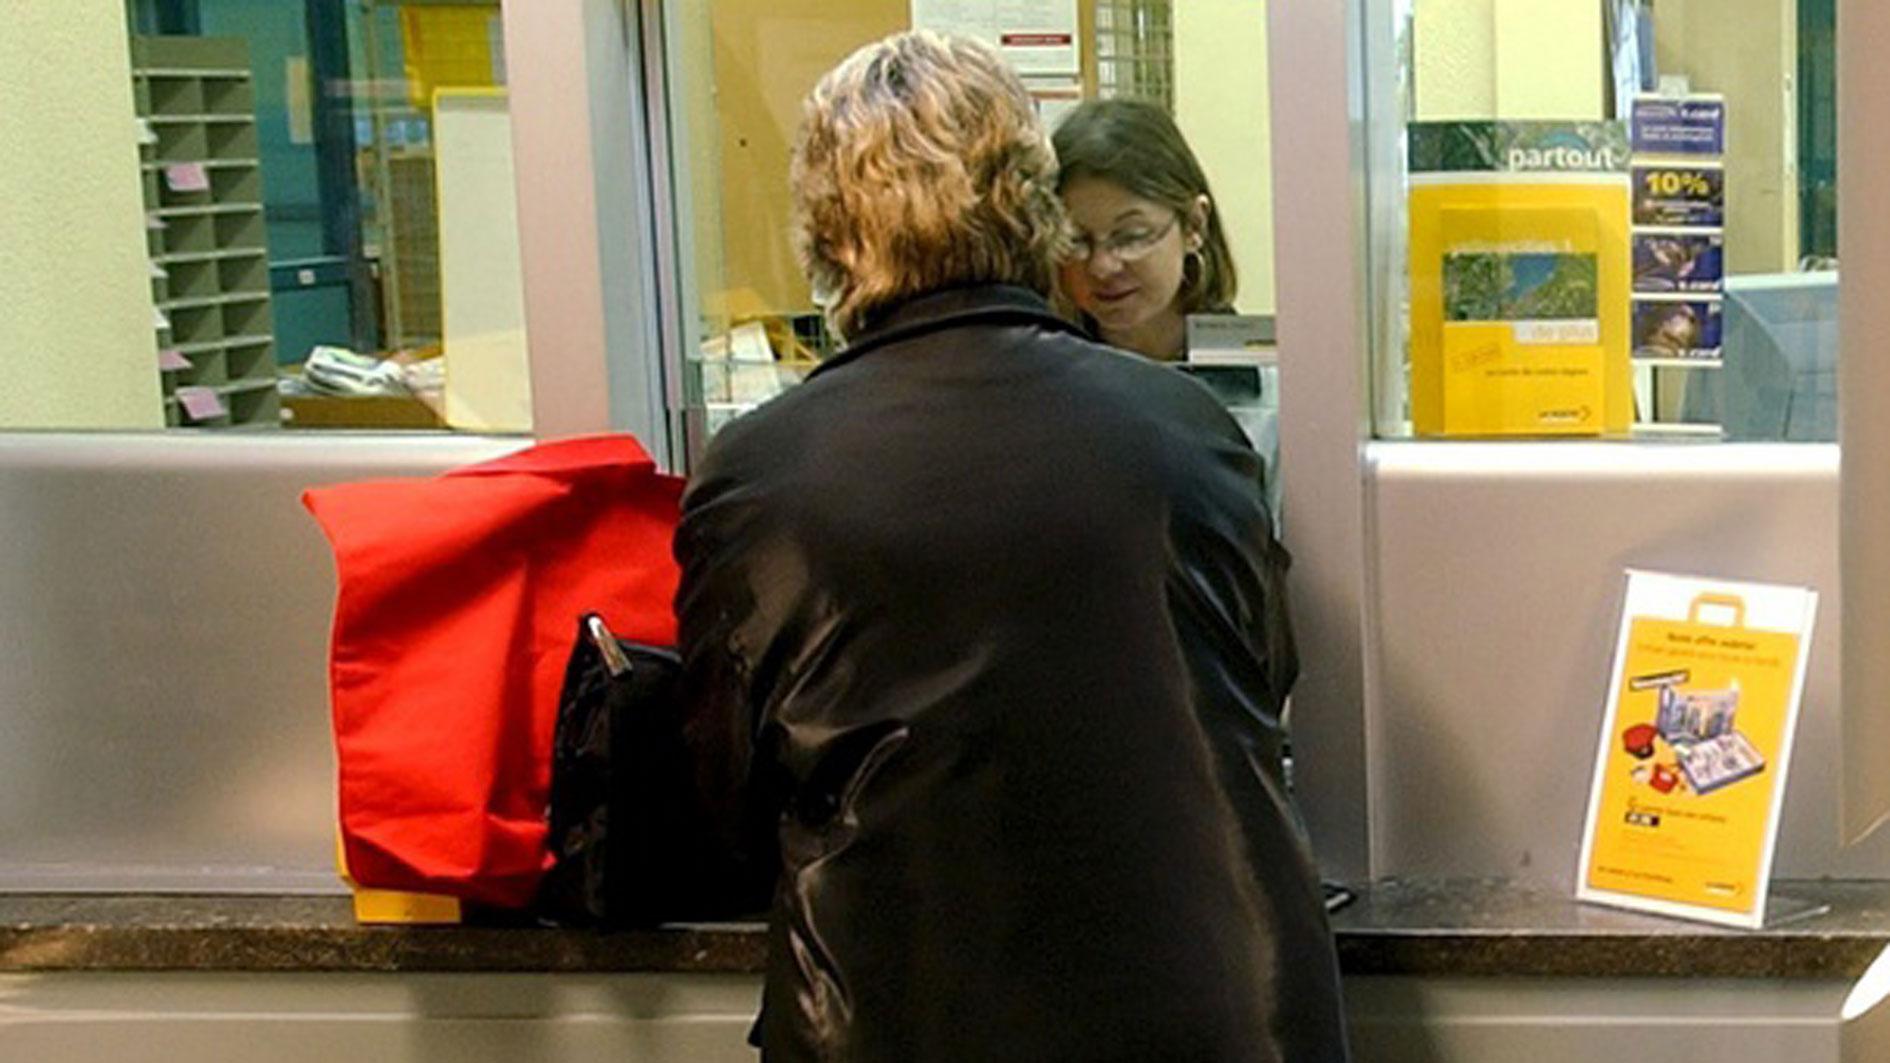 Euro Wechsel-Kurs: 180 Franken zu viel bezahlt